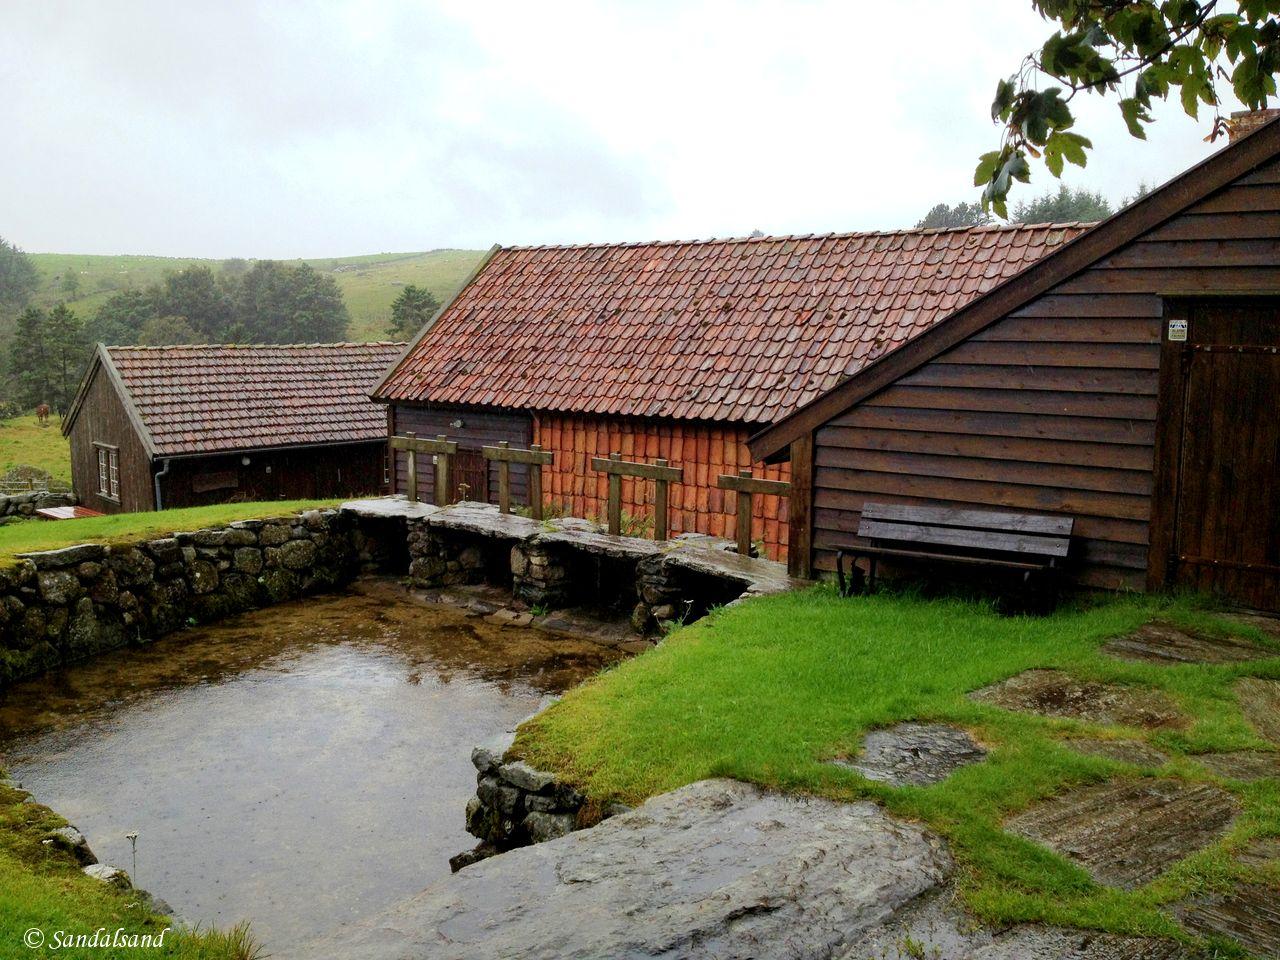 Rogaland - Time - Fotland mølle